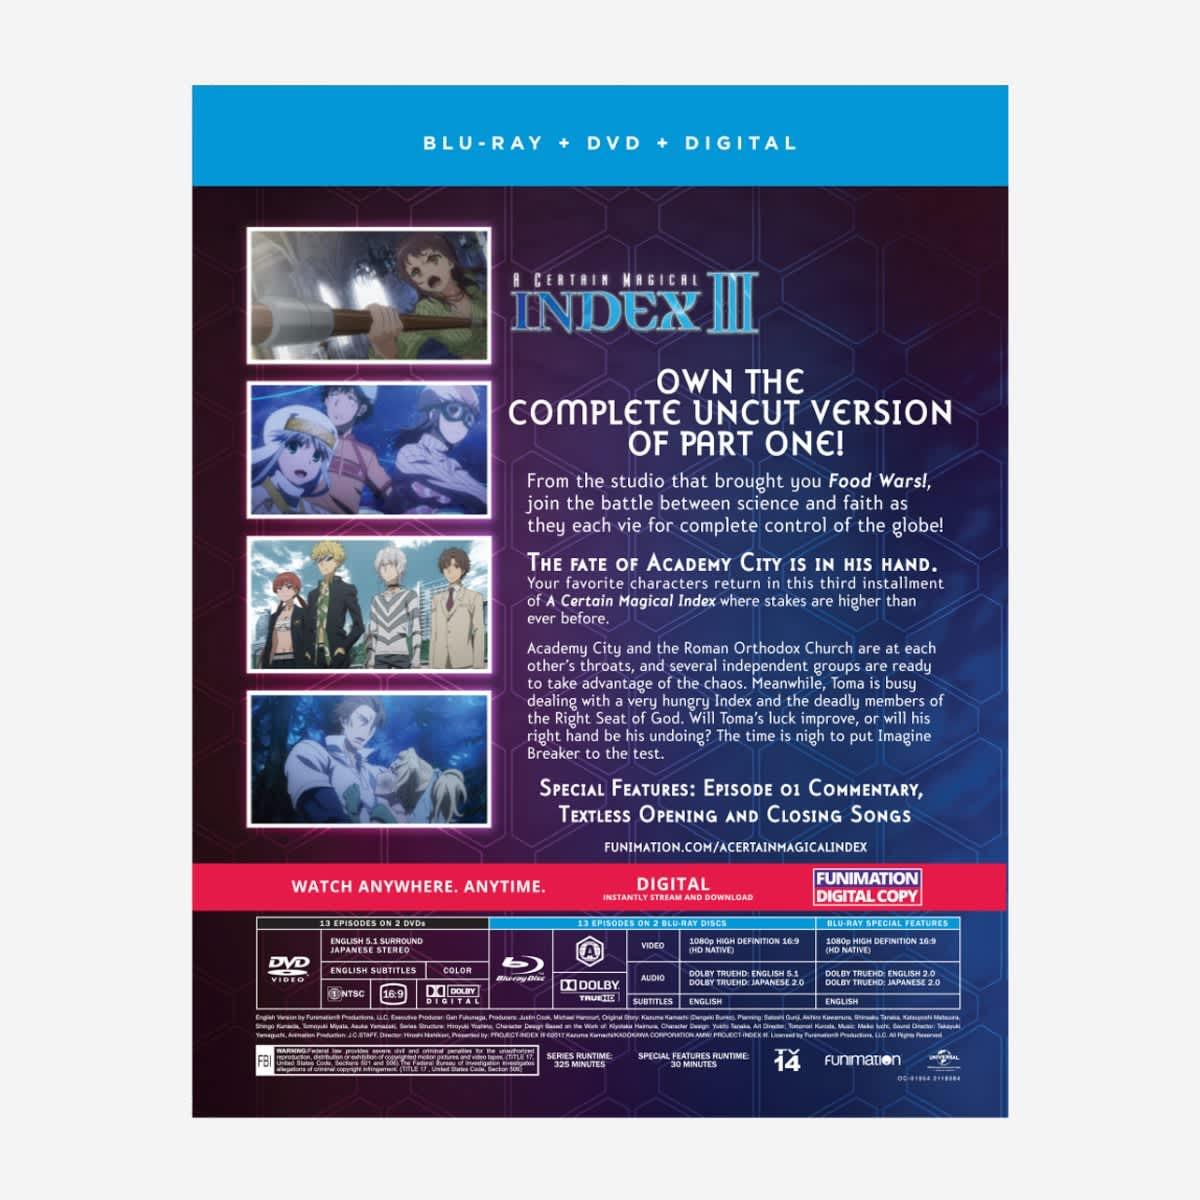 A Certain Magical Index Season 3 Part 1 Blu-Ray/DVD